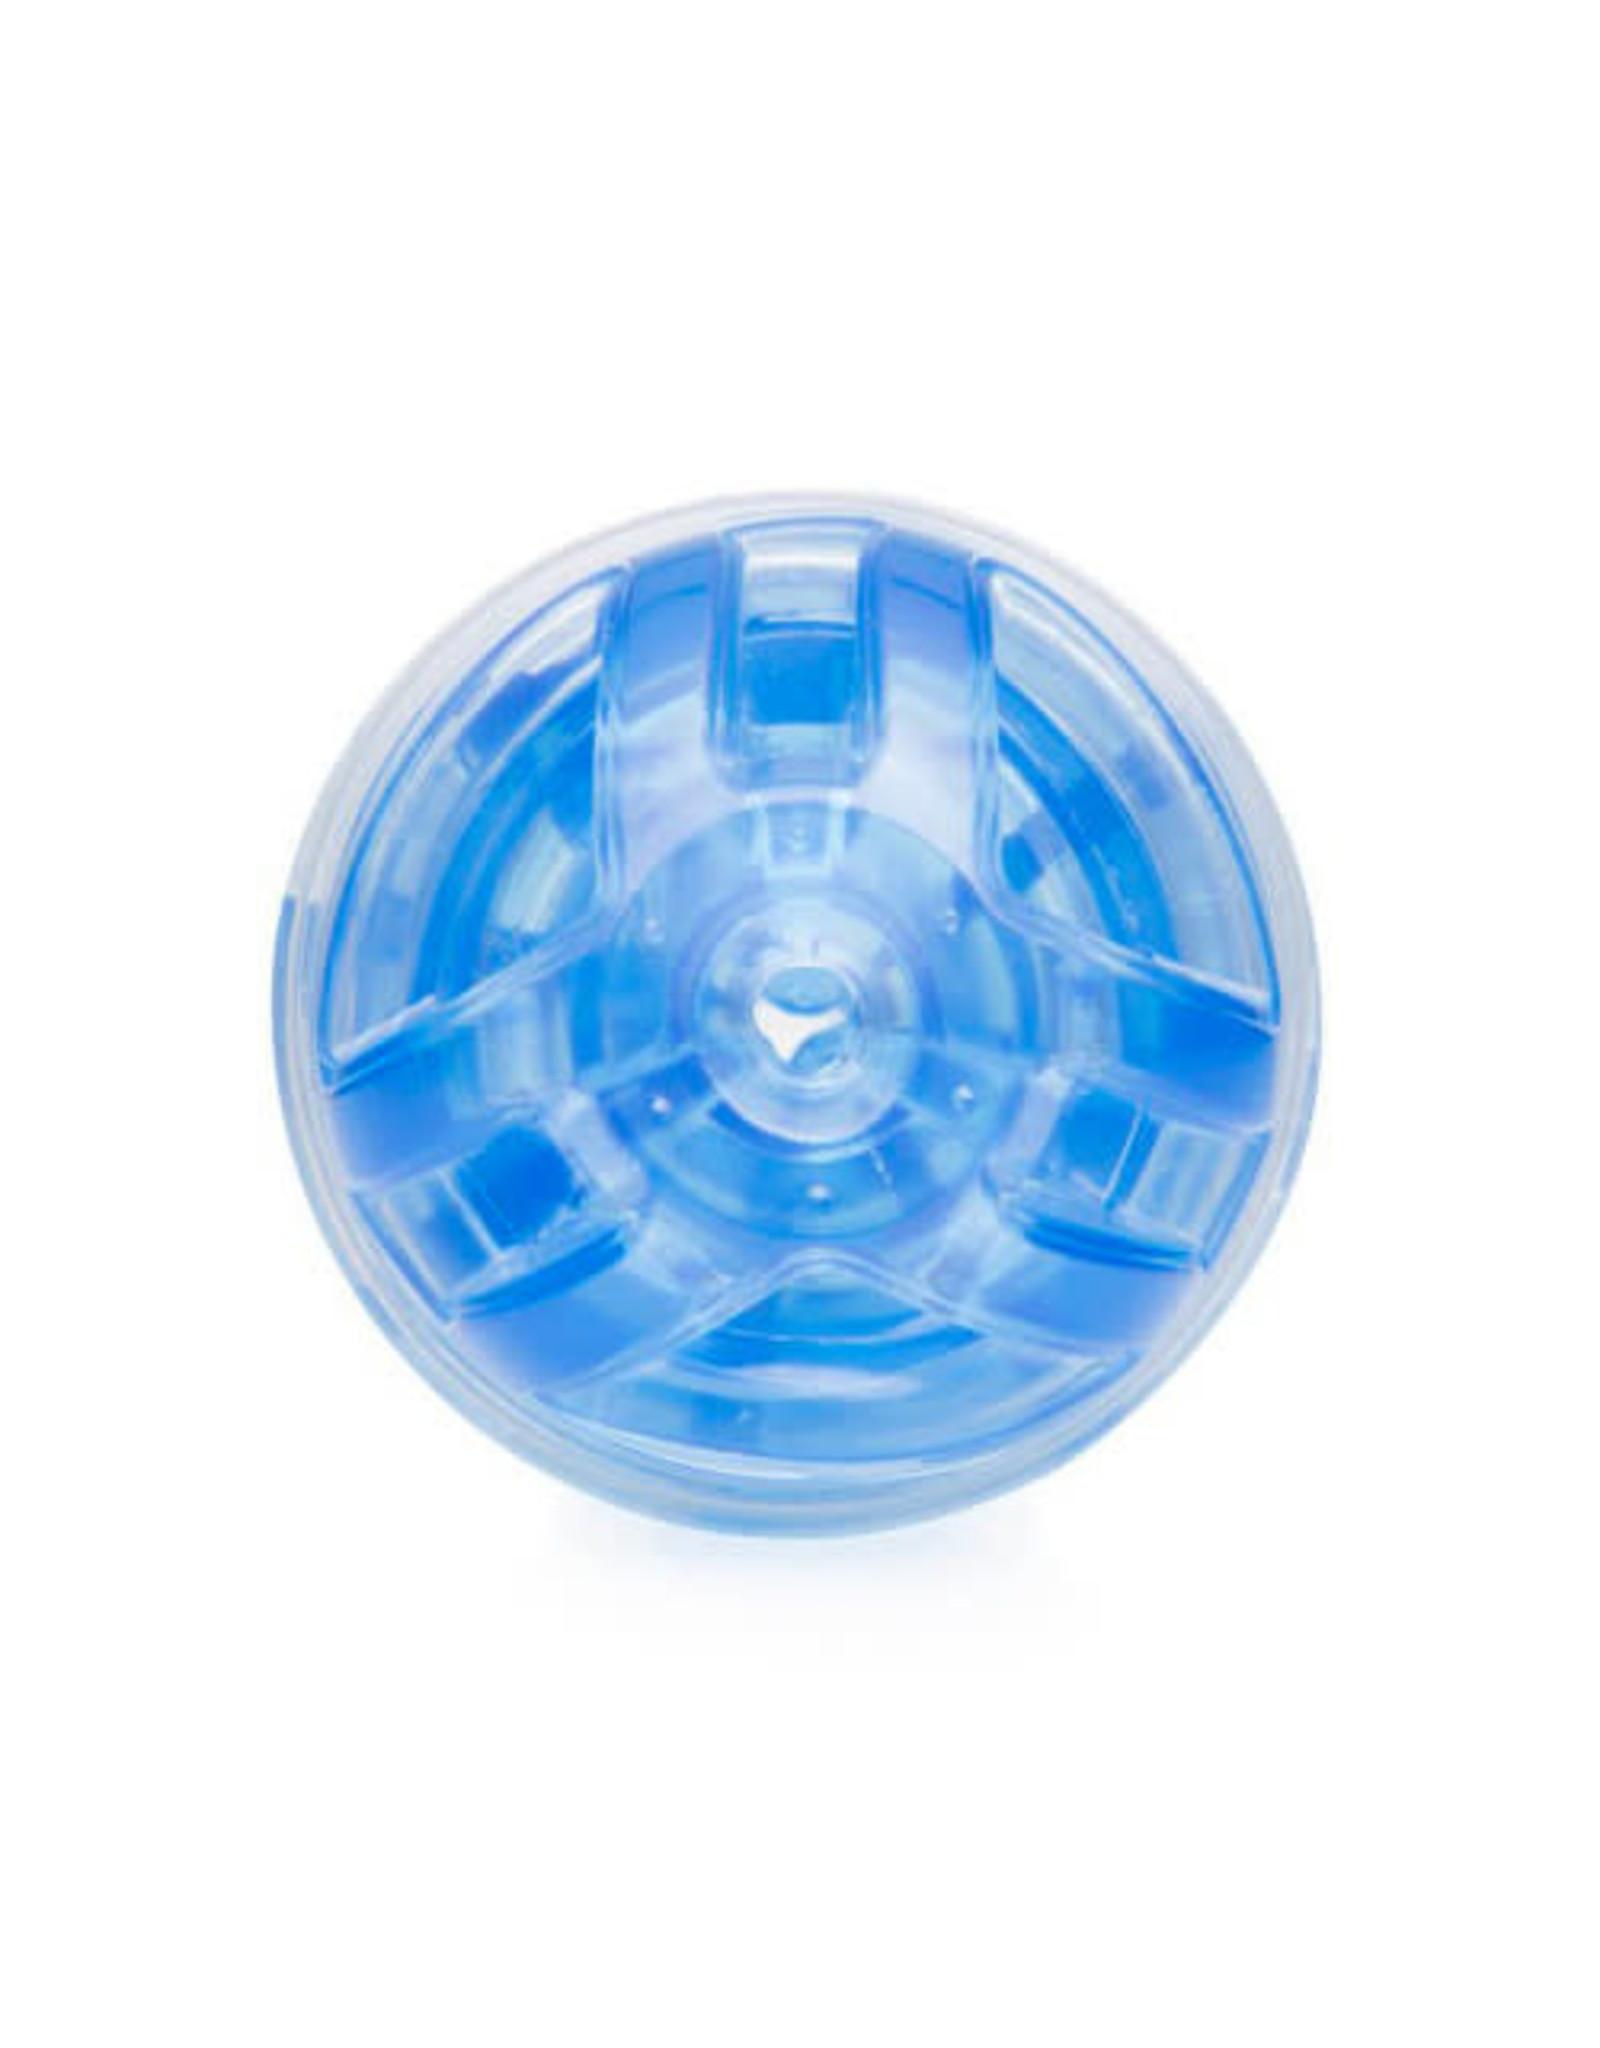 Fleshlight International S.L. Fleshlight Ignition Blue